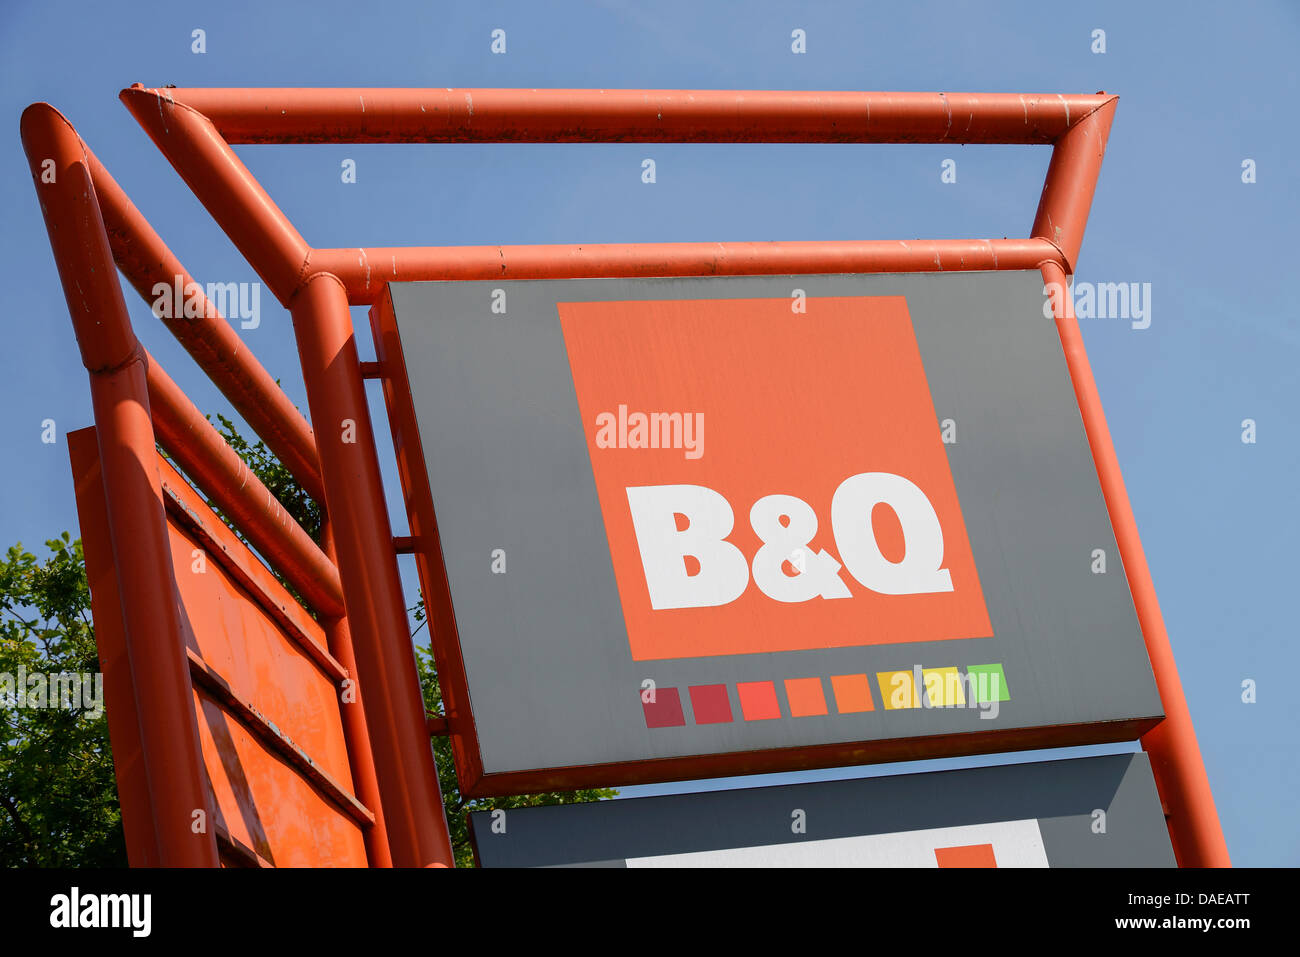 B&Q signage - Stock Image